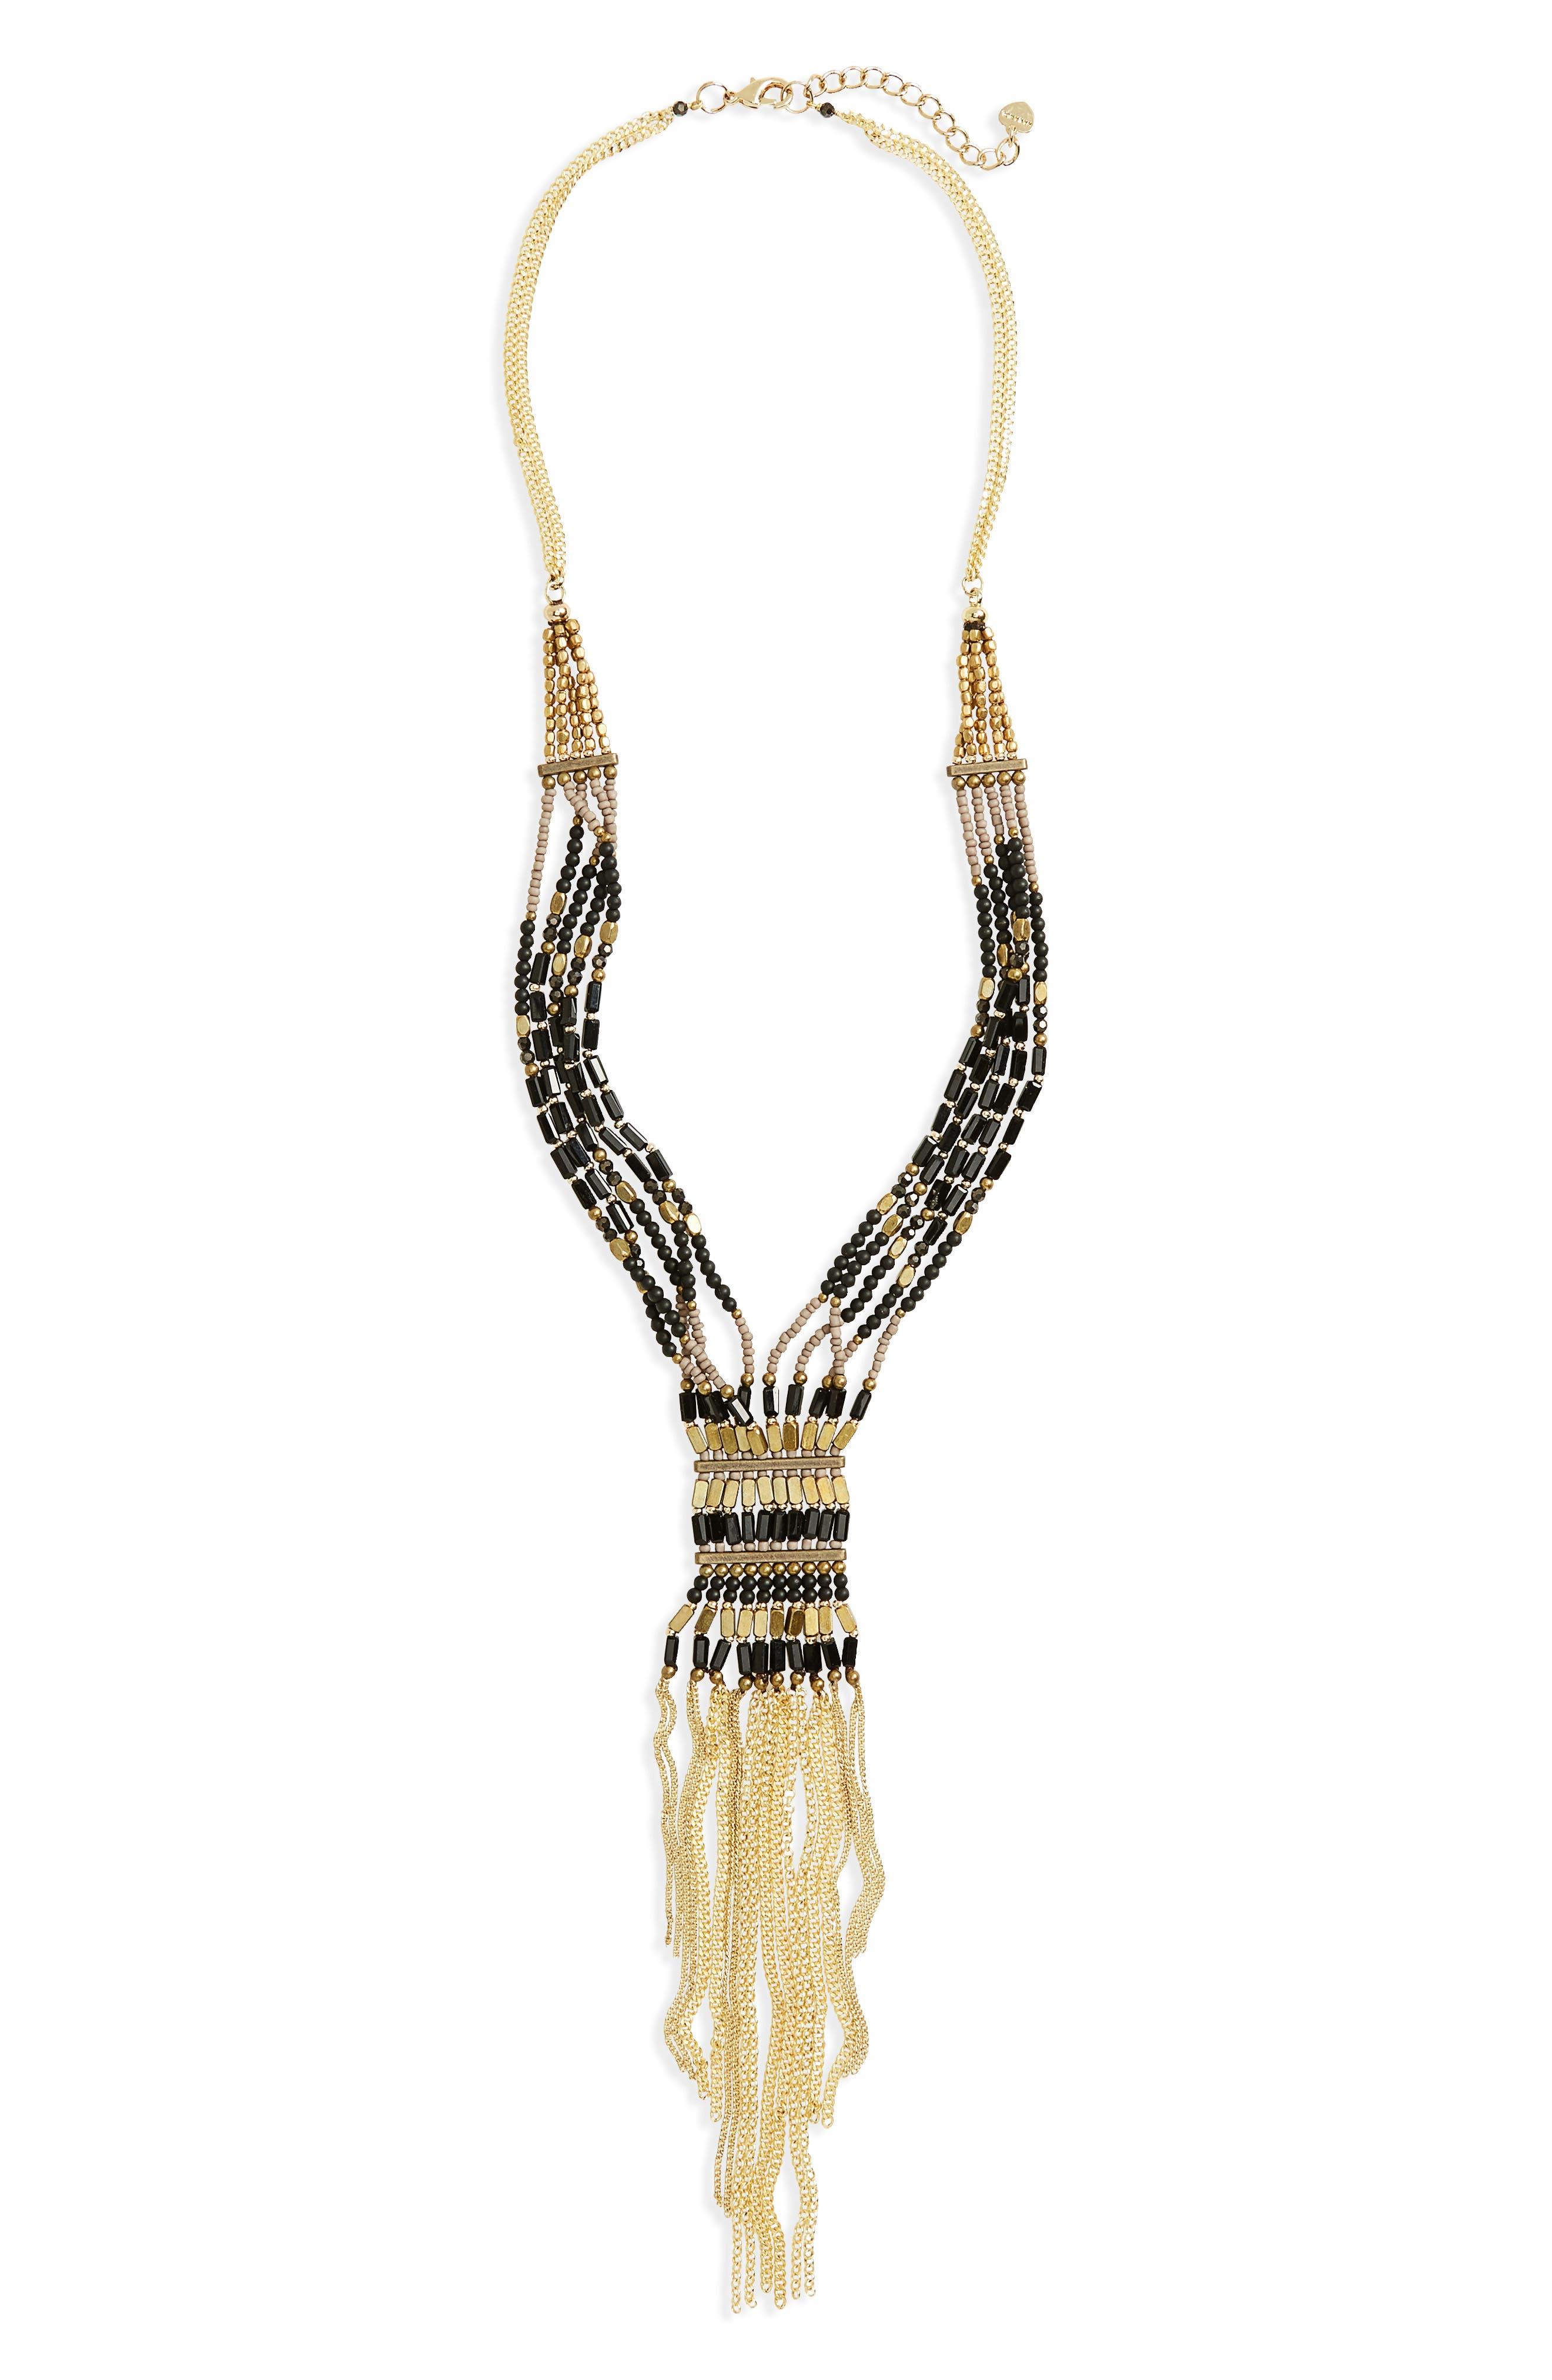 Alternate Image 1 Selected - Nakamol Design Stone & Seed Bead Fringe Statement Necklace